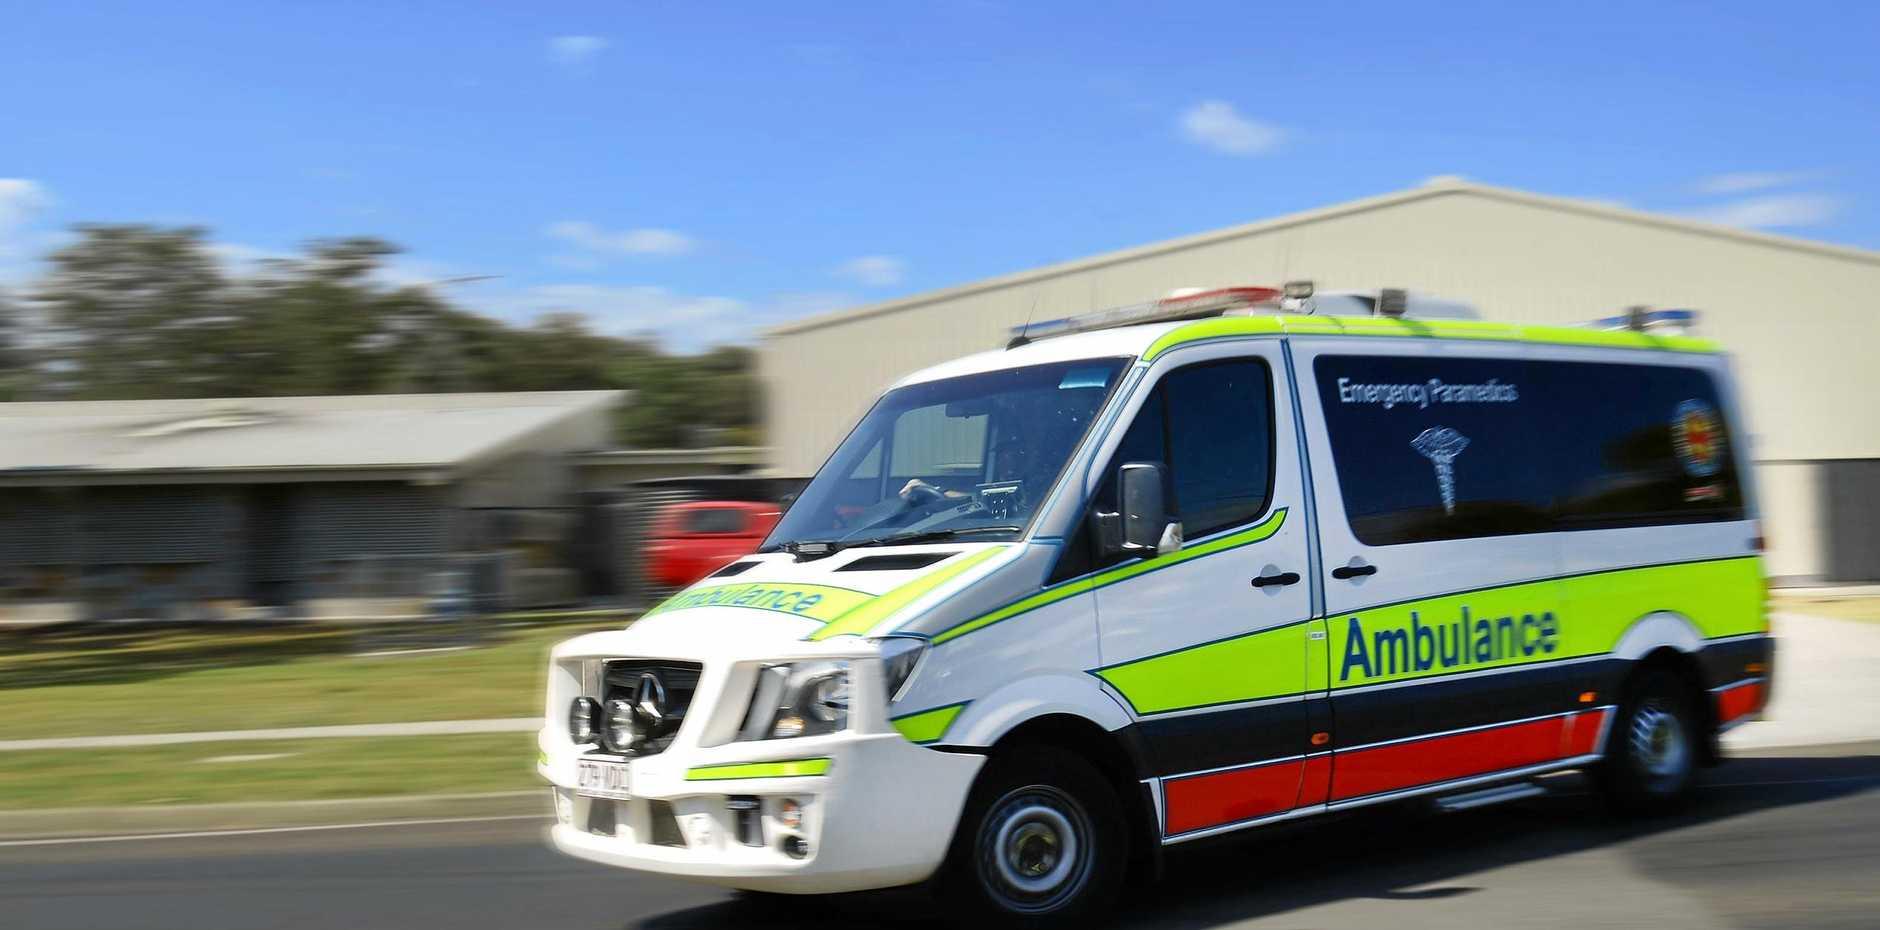 Queensland Ambulance Service paramedics have been called to a motorcycle crash on Botha Street at Blacks Beach.